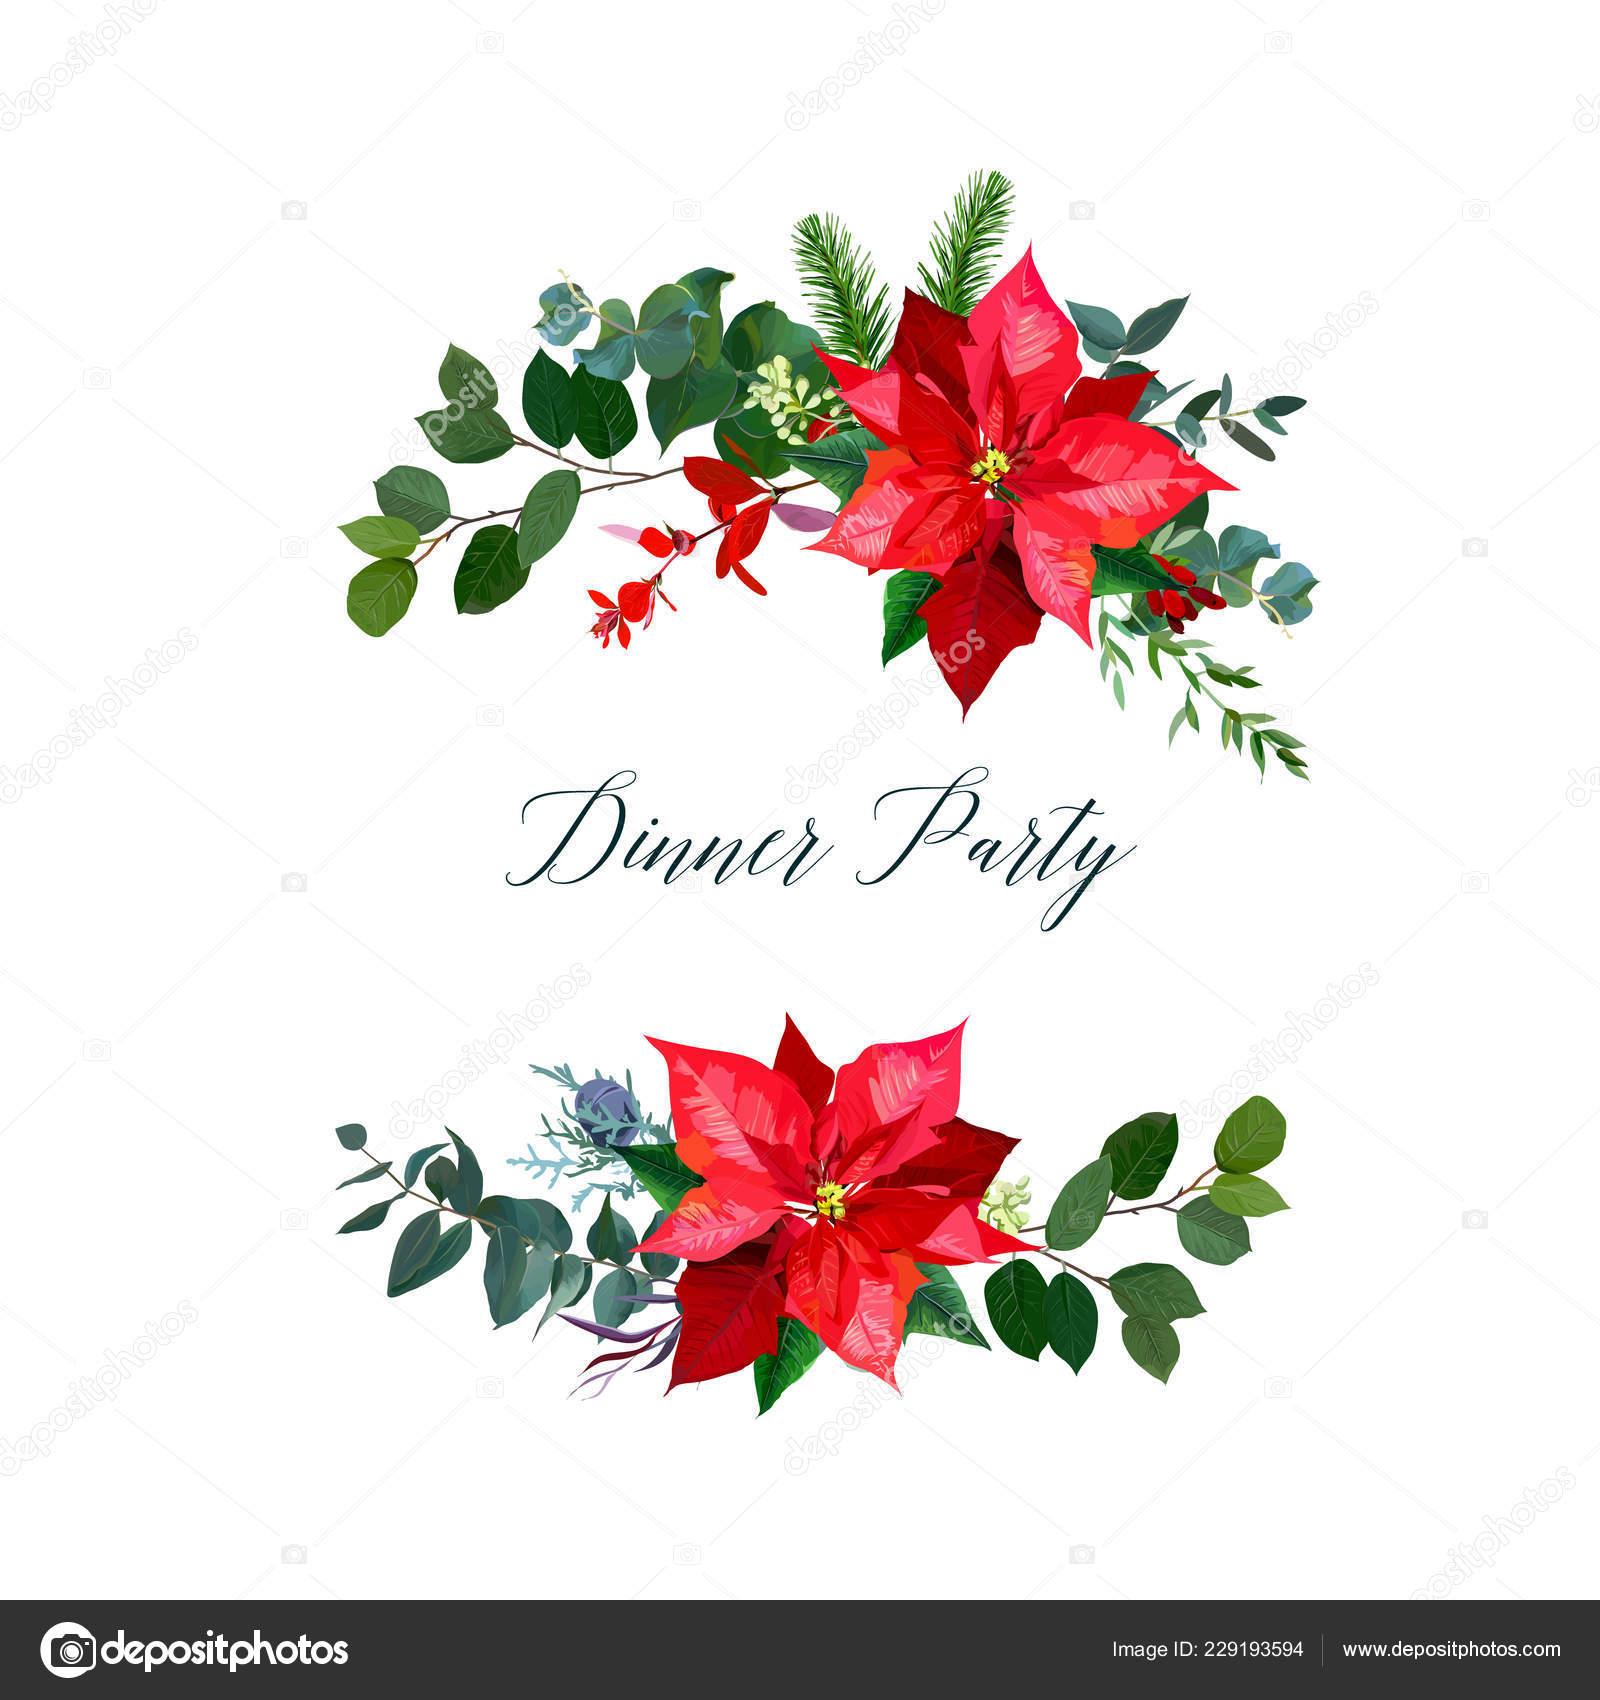 Christmas Greenery Vector.Red Poinsettia Flowers Christmas Greenery Emerald